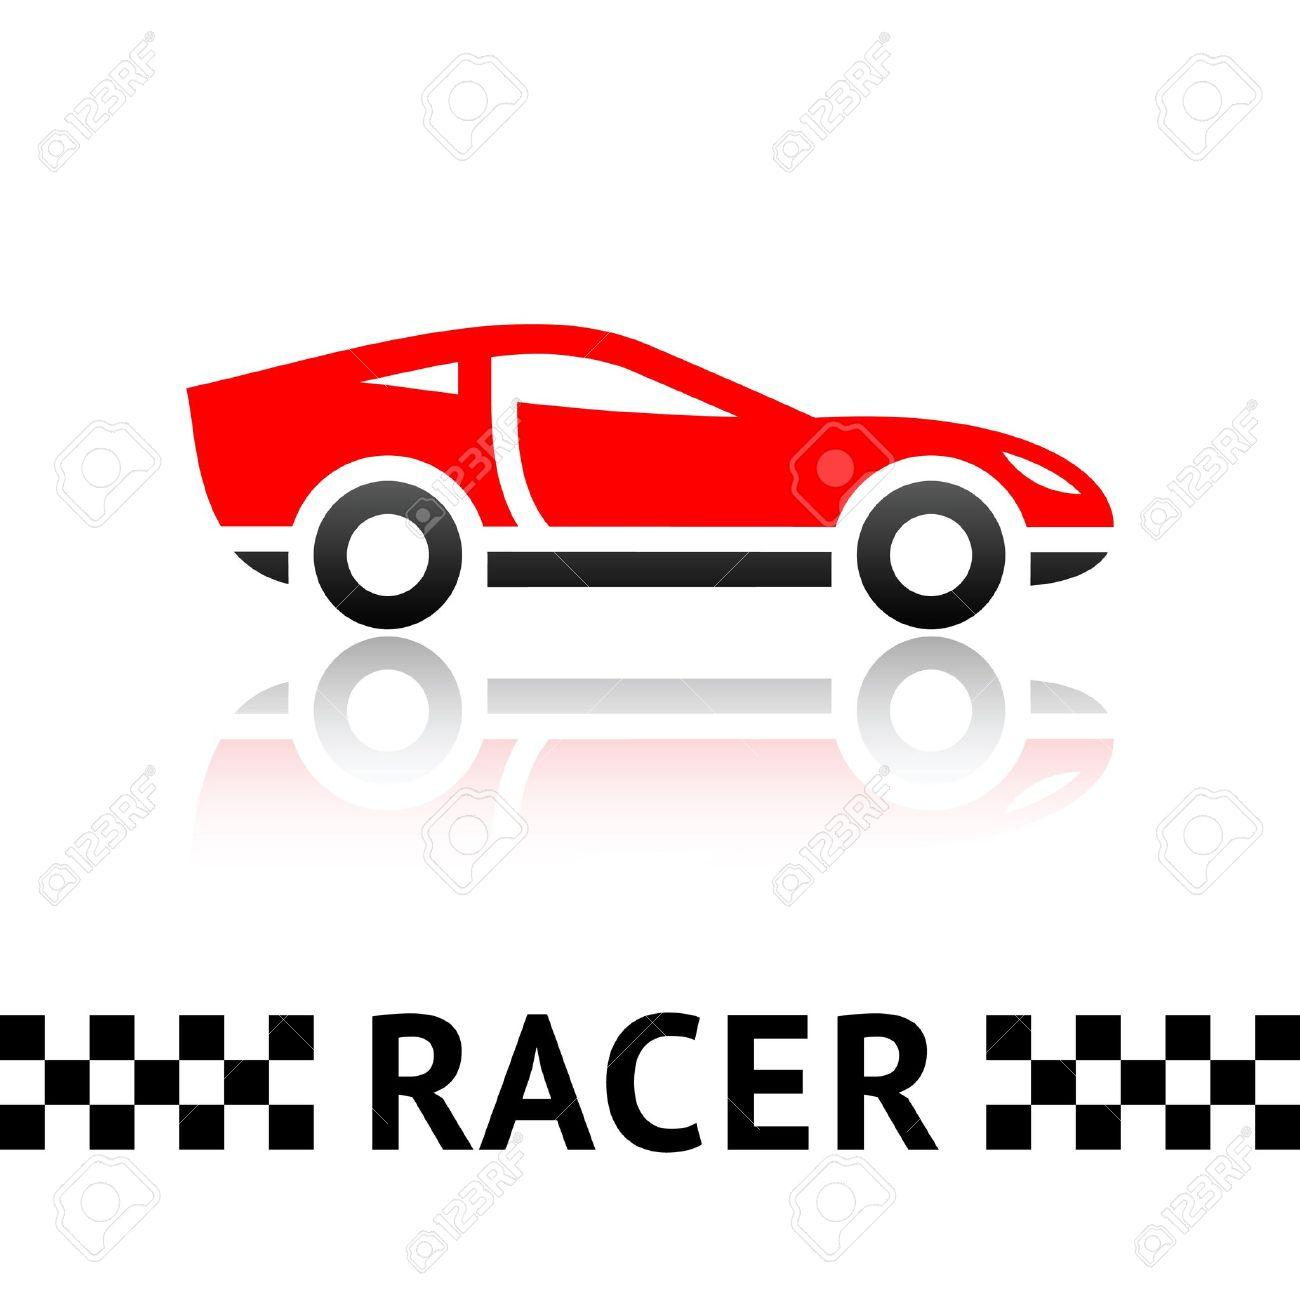 race car symbol royalty free cliparts vectors and stock rh 123rf com race car vector templates race car vector package